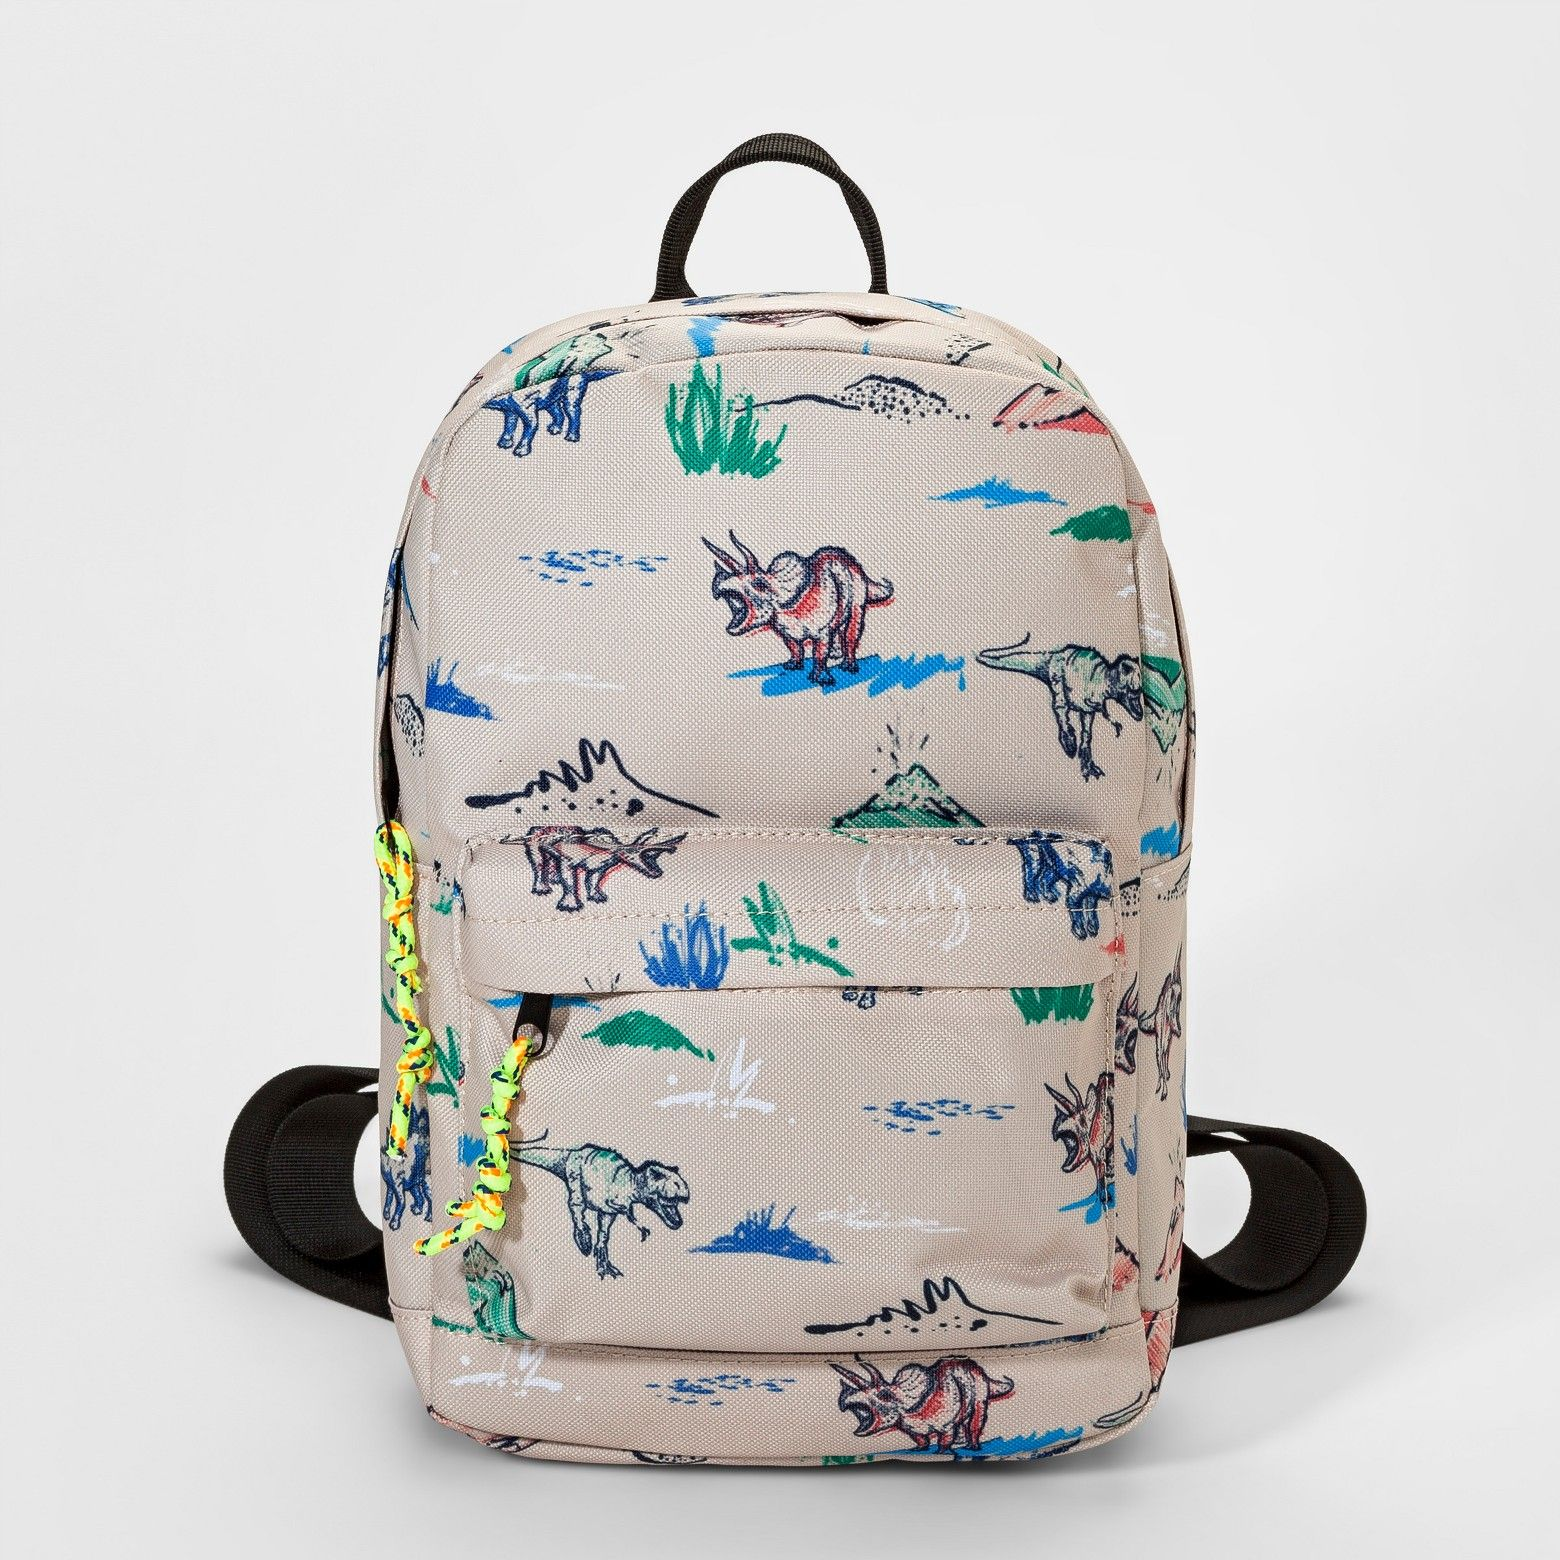 Toddler Boys  Dinosaur Backpack Handbag - Cat   Jack™ Tan  9b4ab7a240761